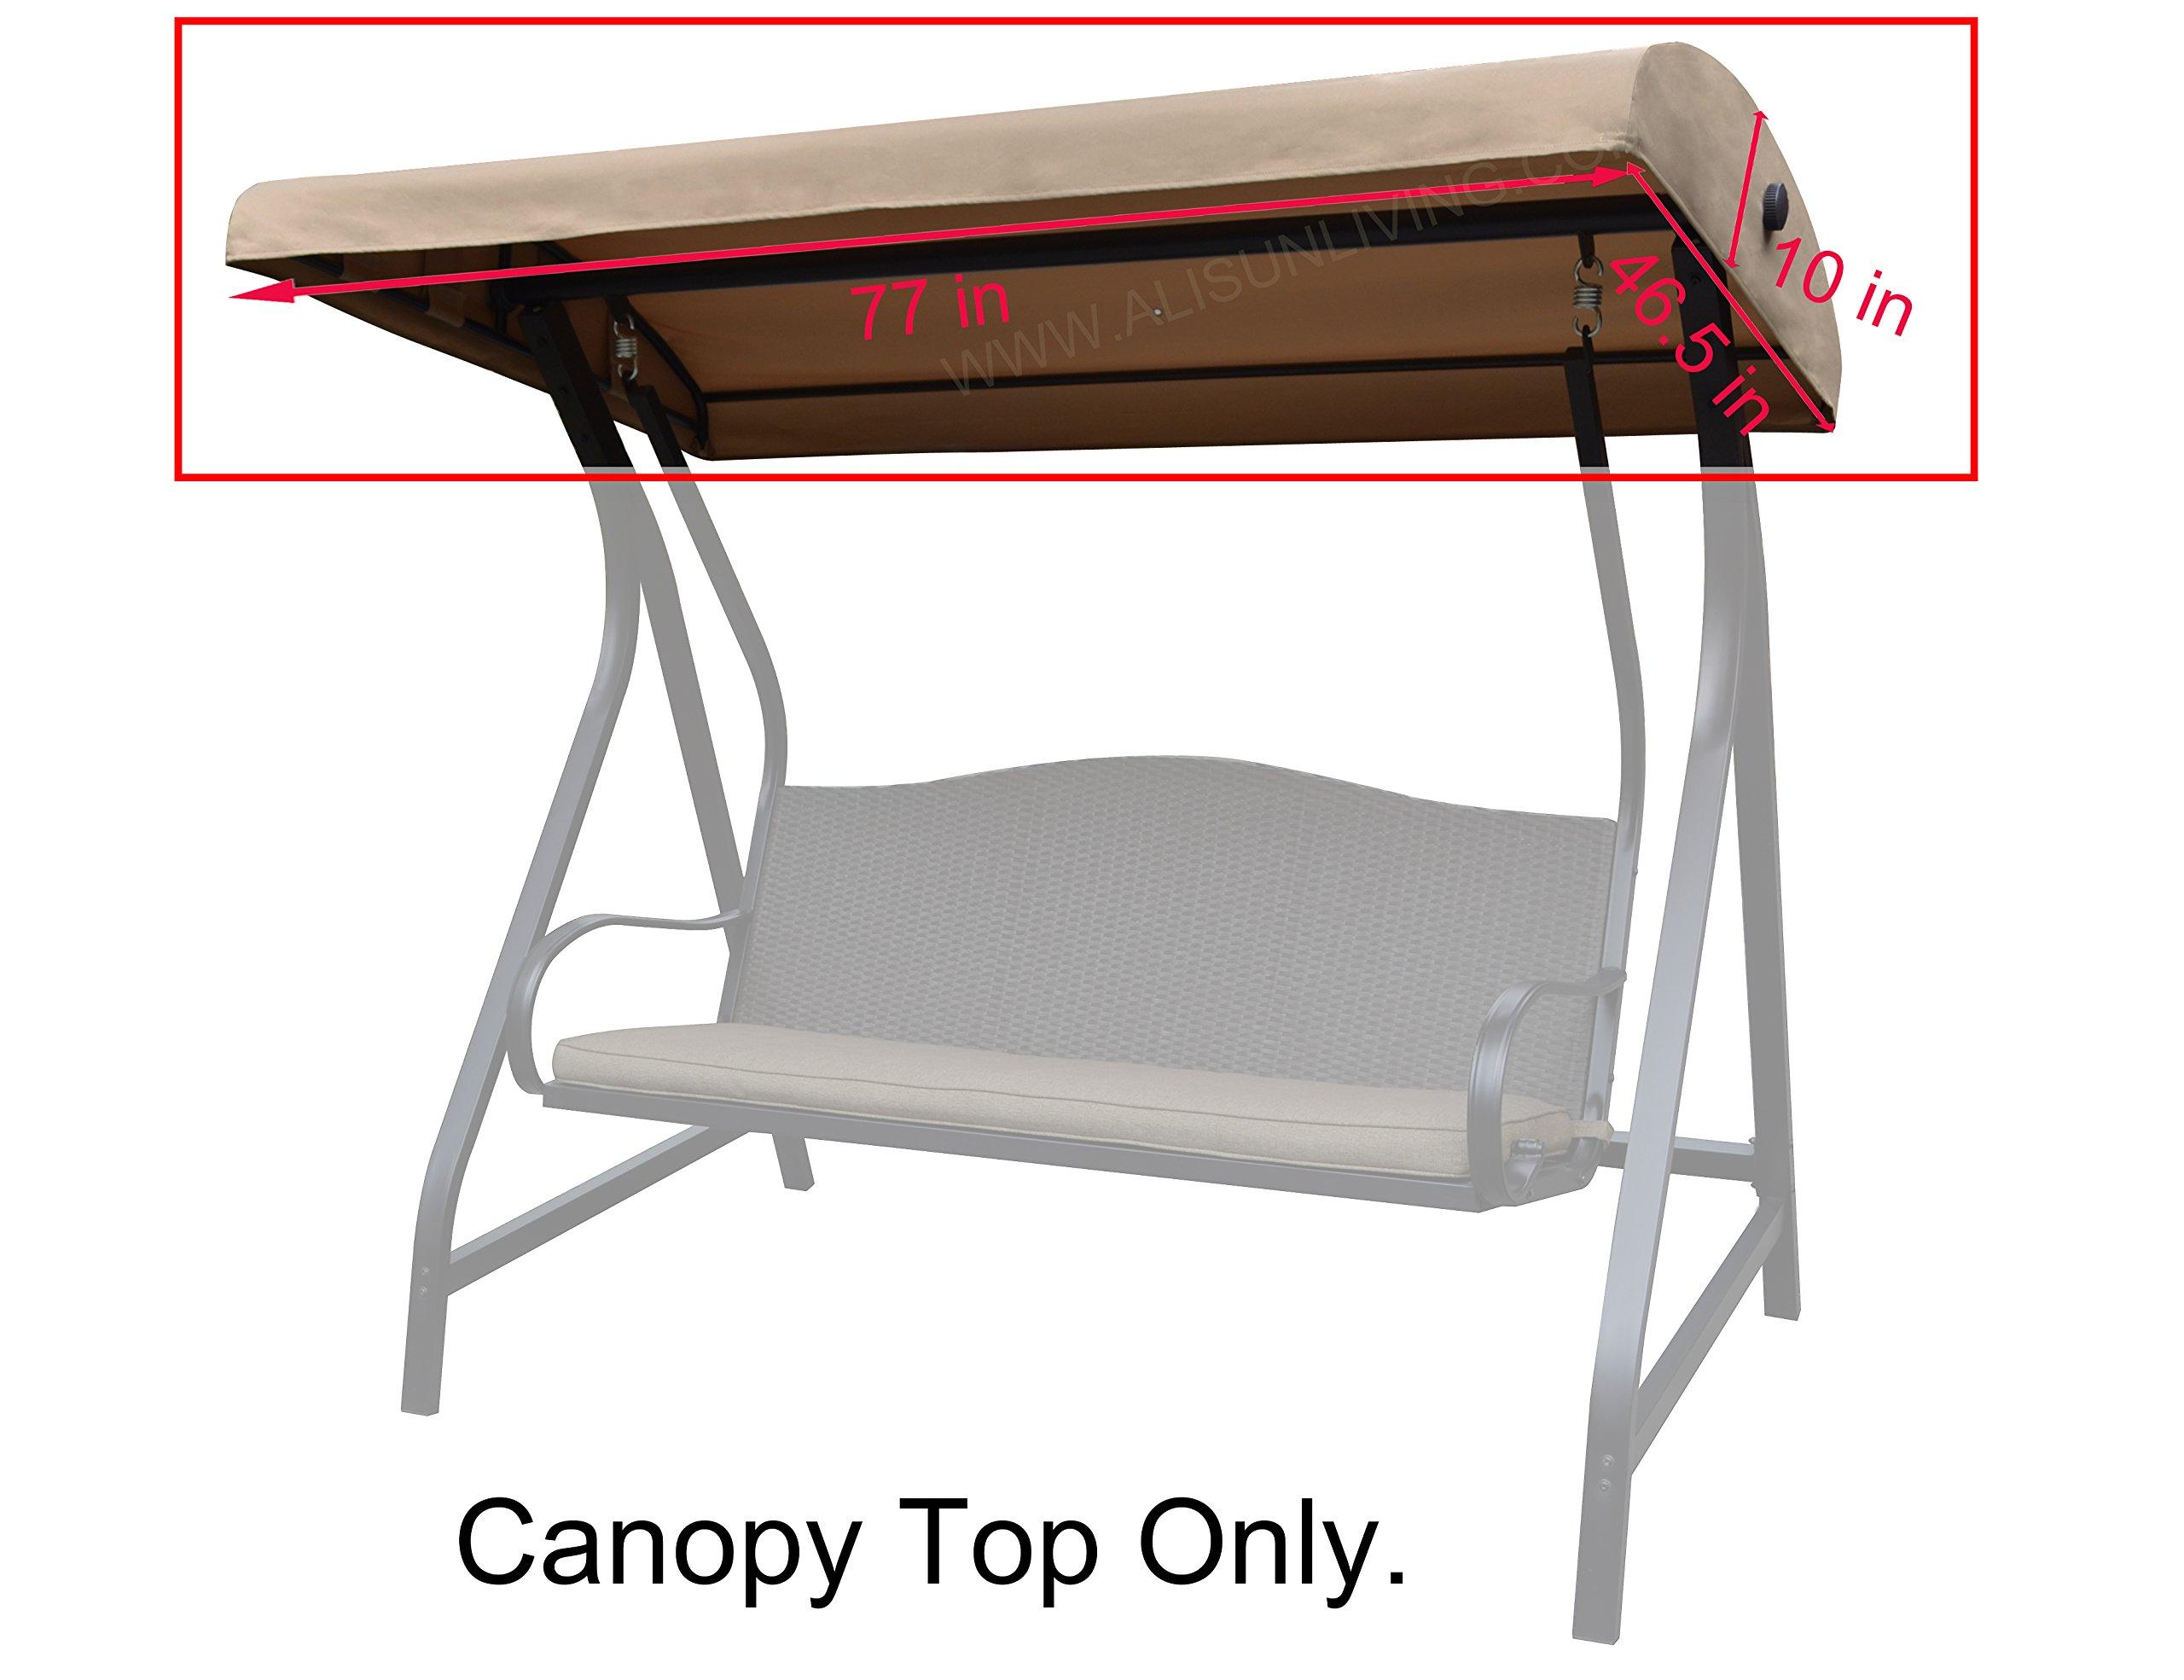 ALISUN Replacement Canopy Top for Lowe's Garden Treasures Porch Swing Model #GCS00229C